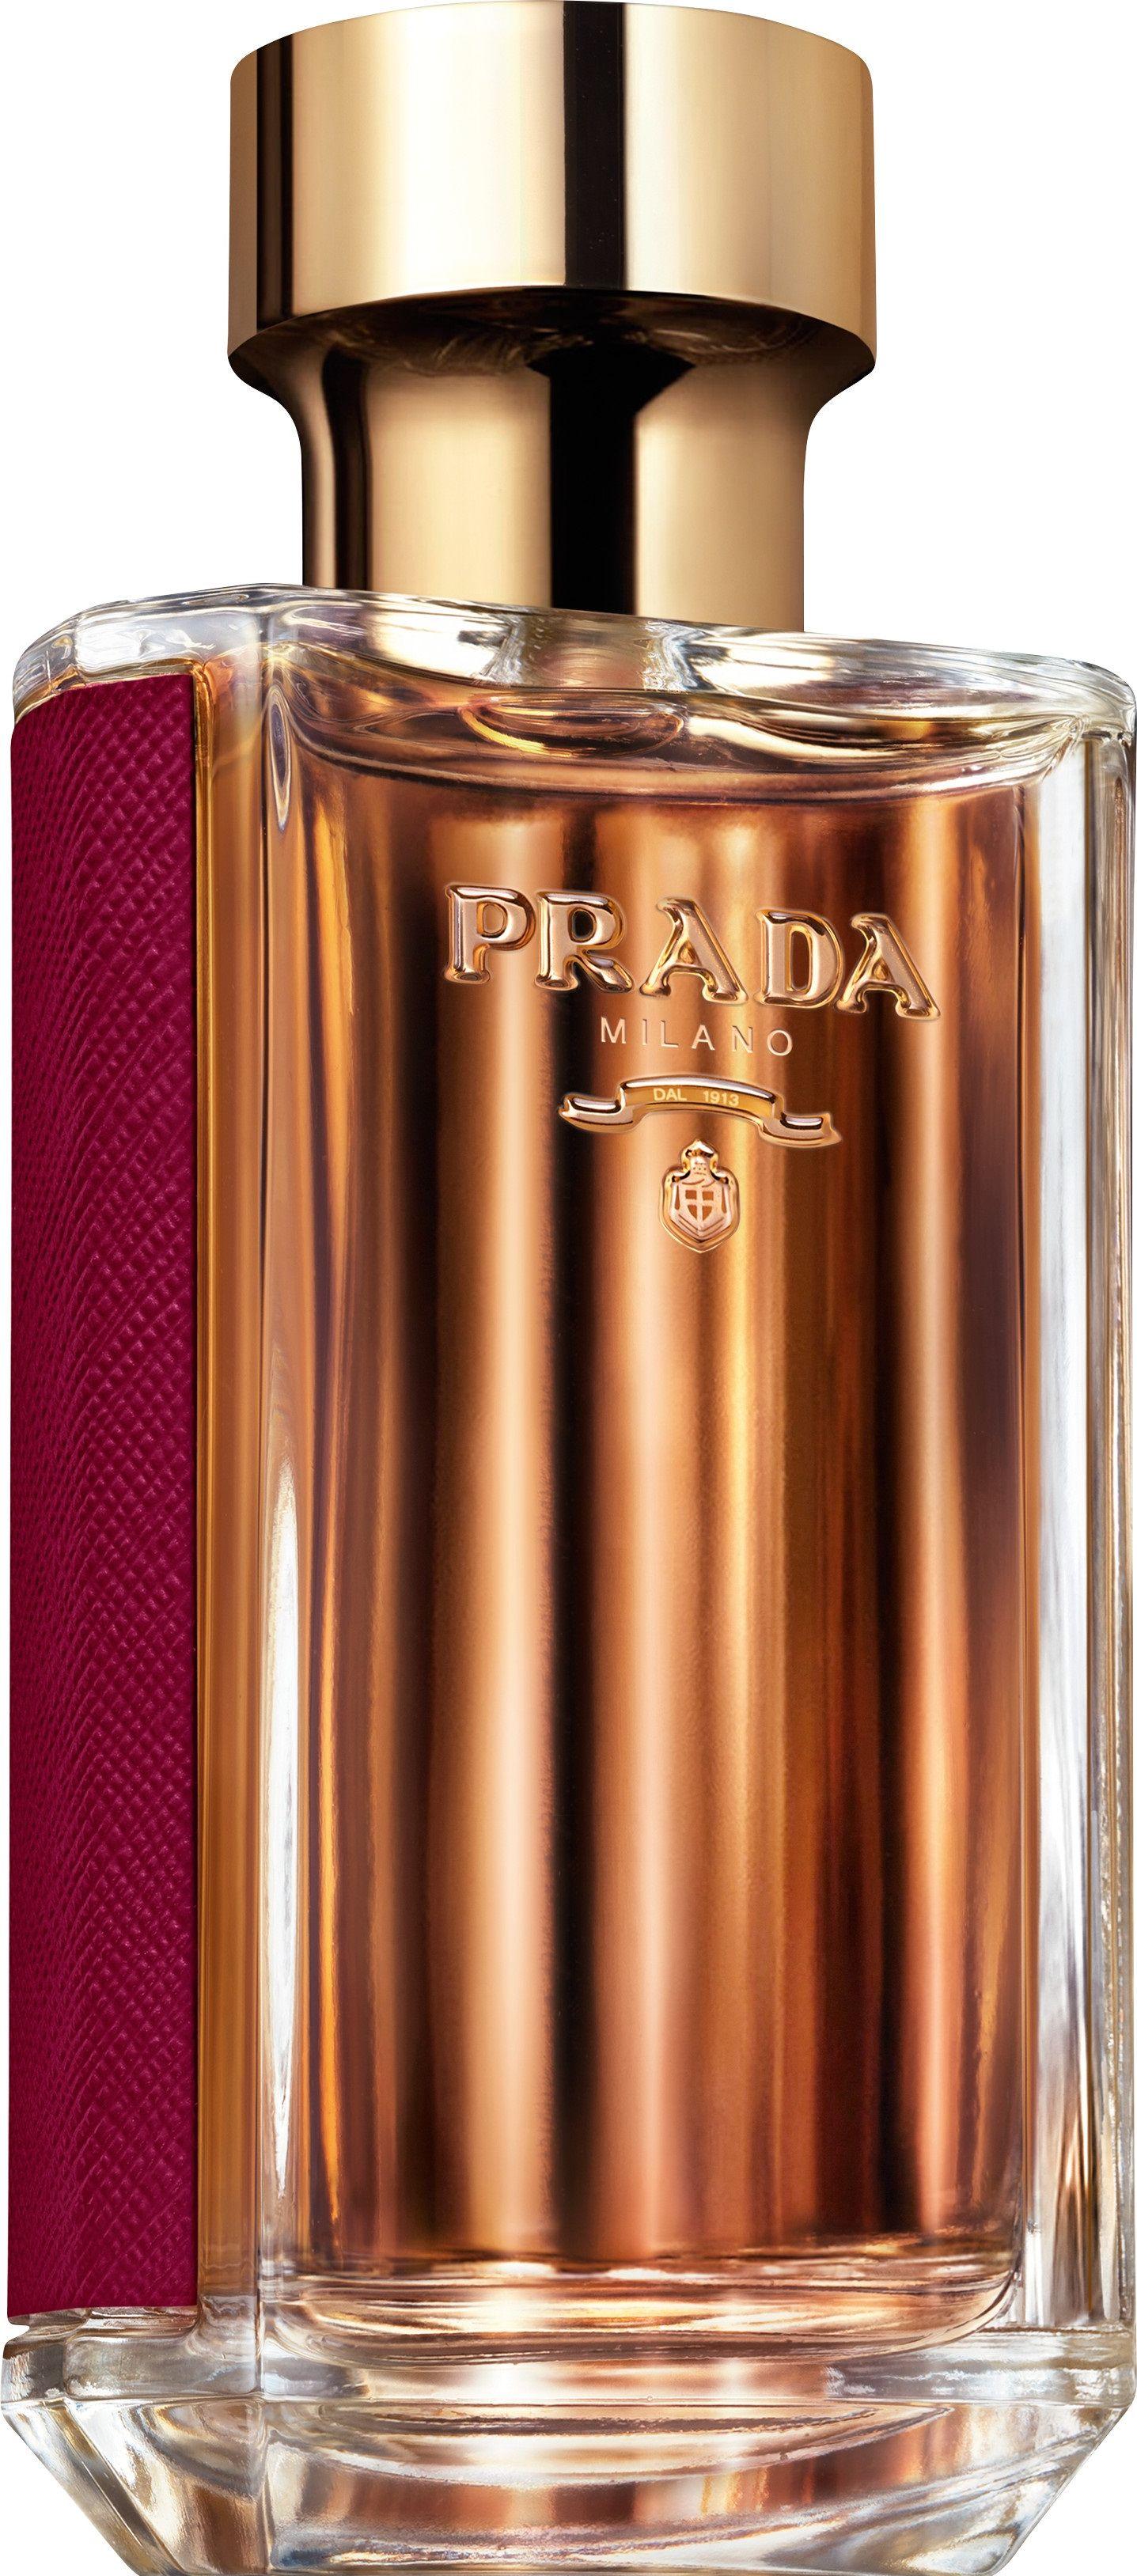 PRADA PRADA La Femme Intense EDP spray 35ml 8435137764372 Smaržas sievietēm